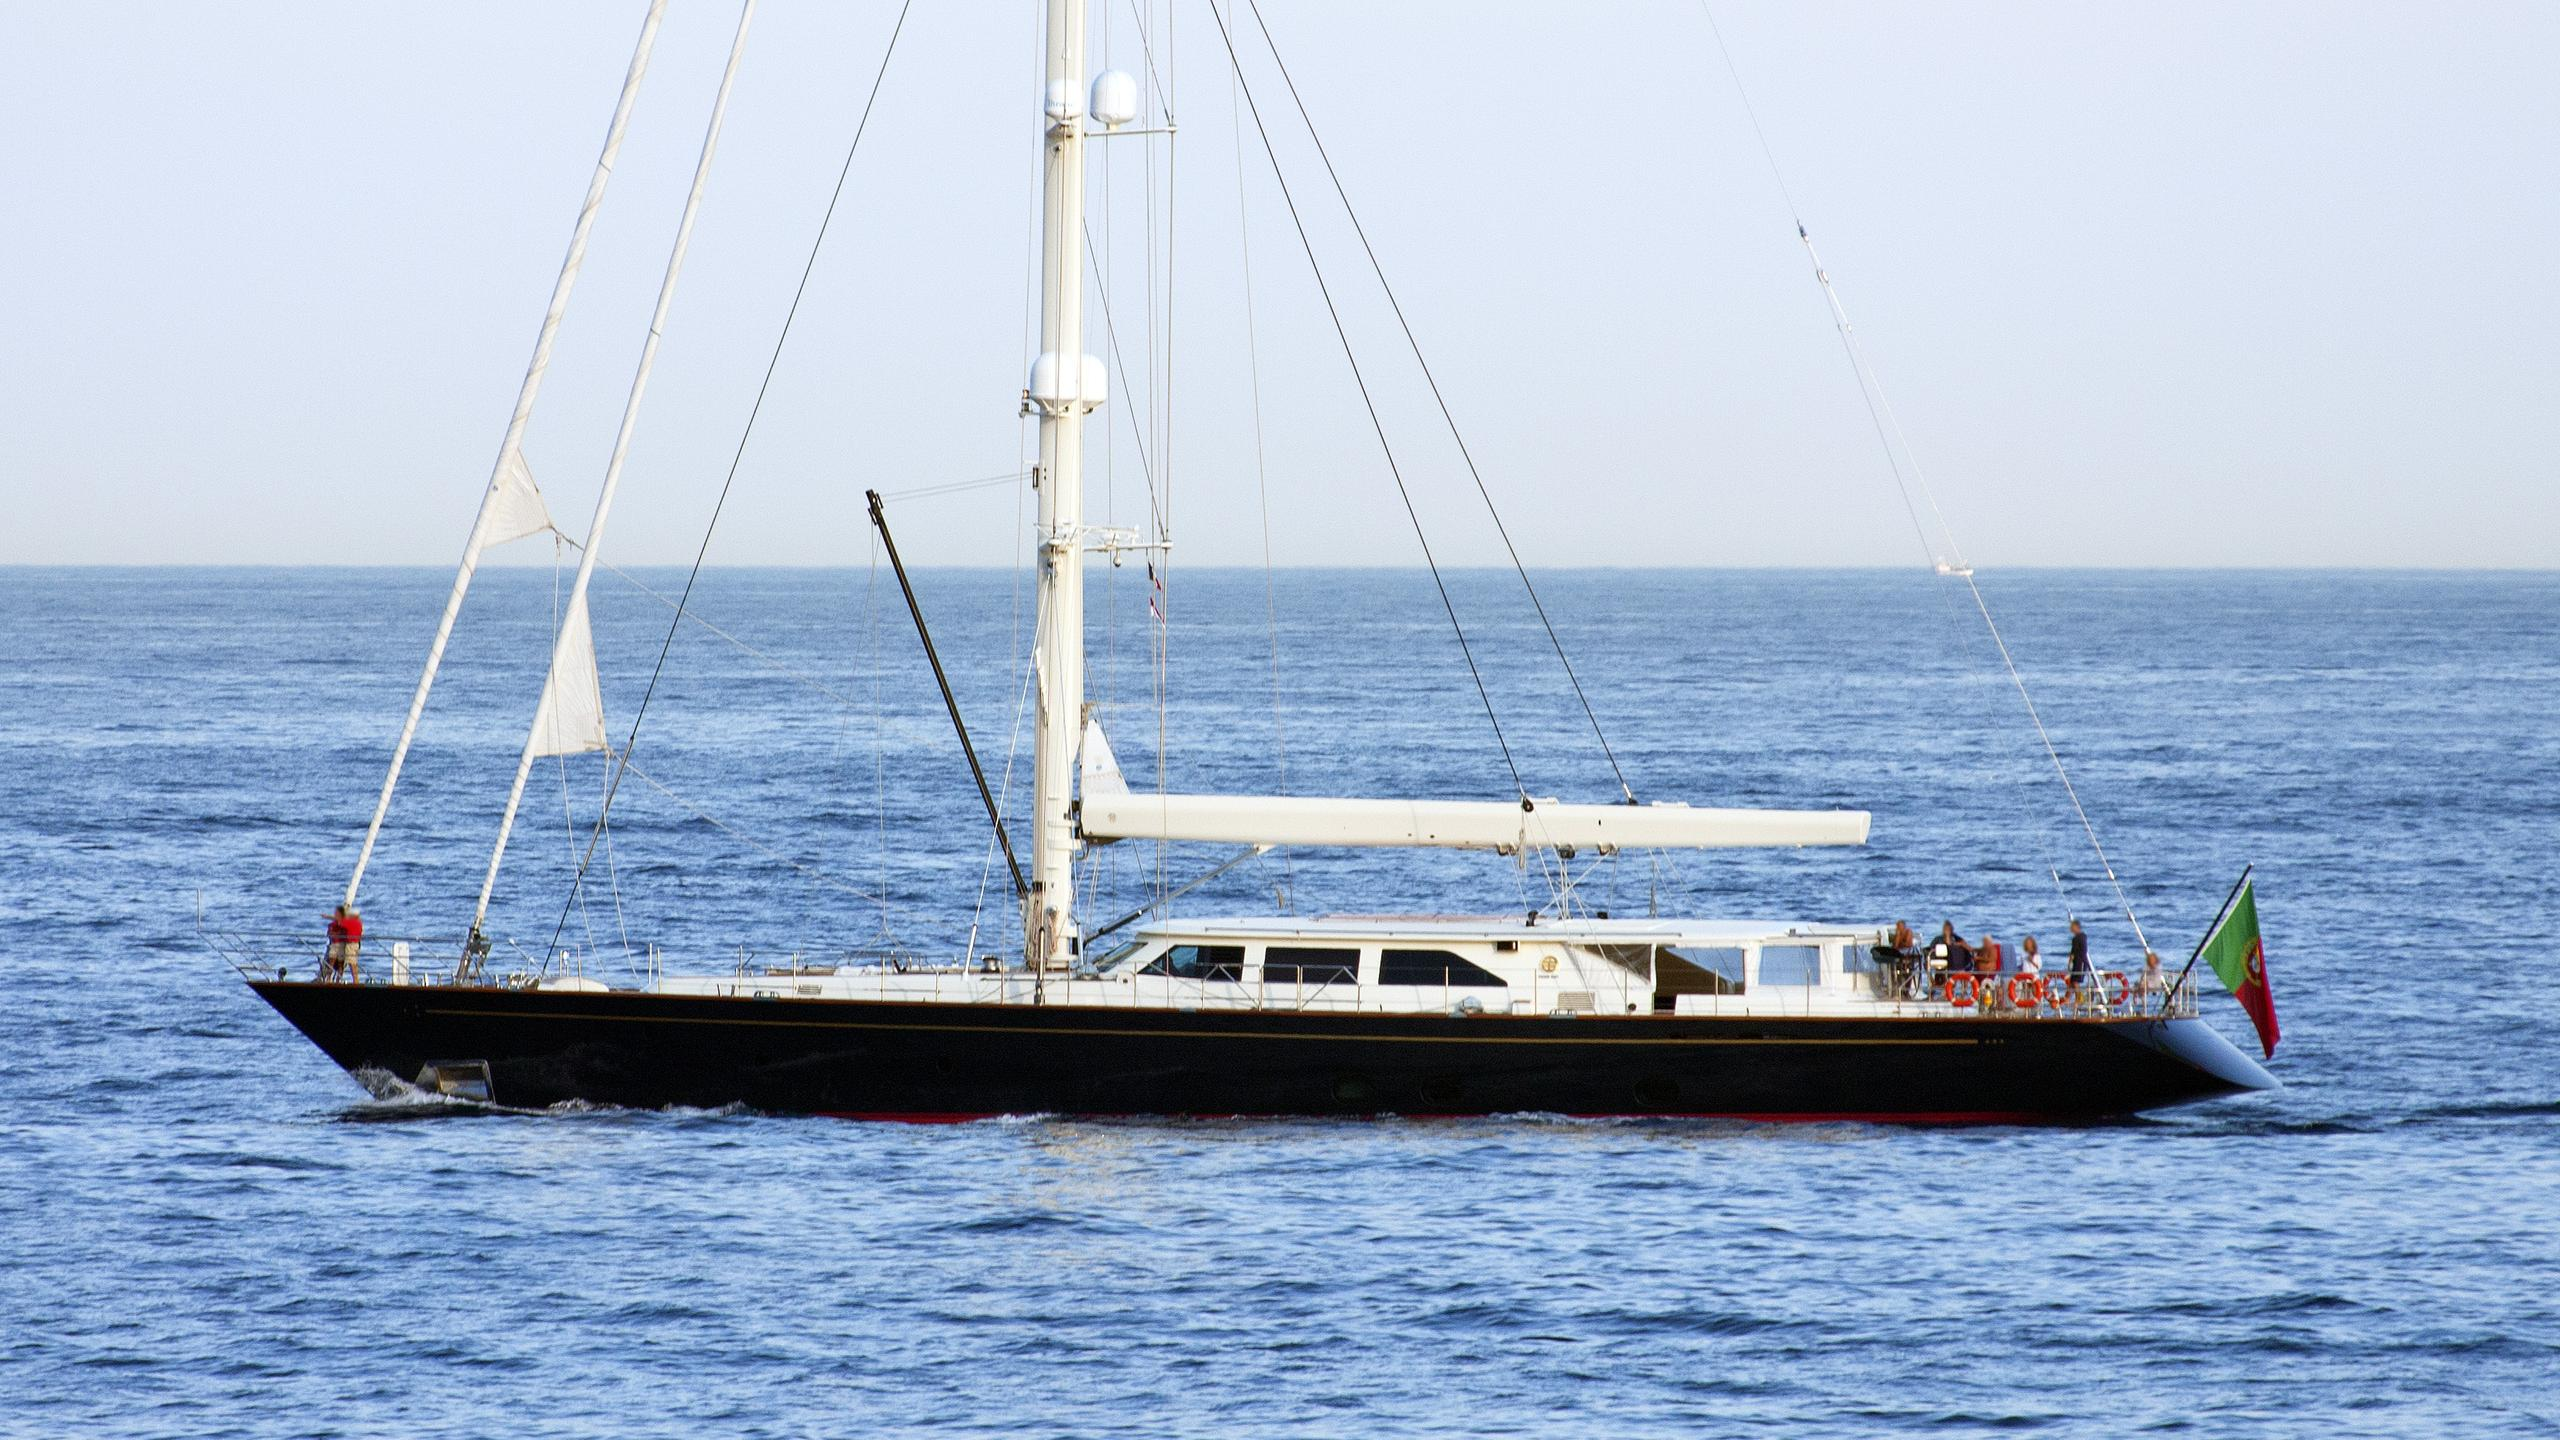 heritage-sailing-yacht-perini-navi-2006-45m-profile